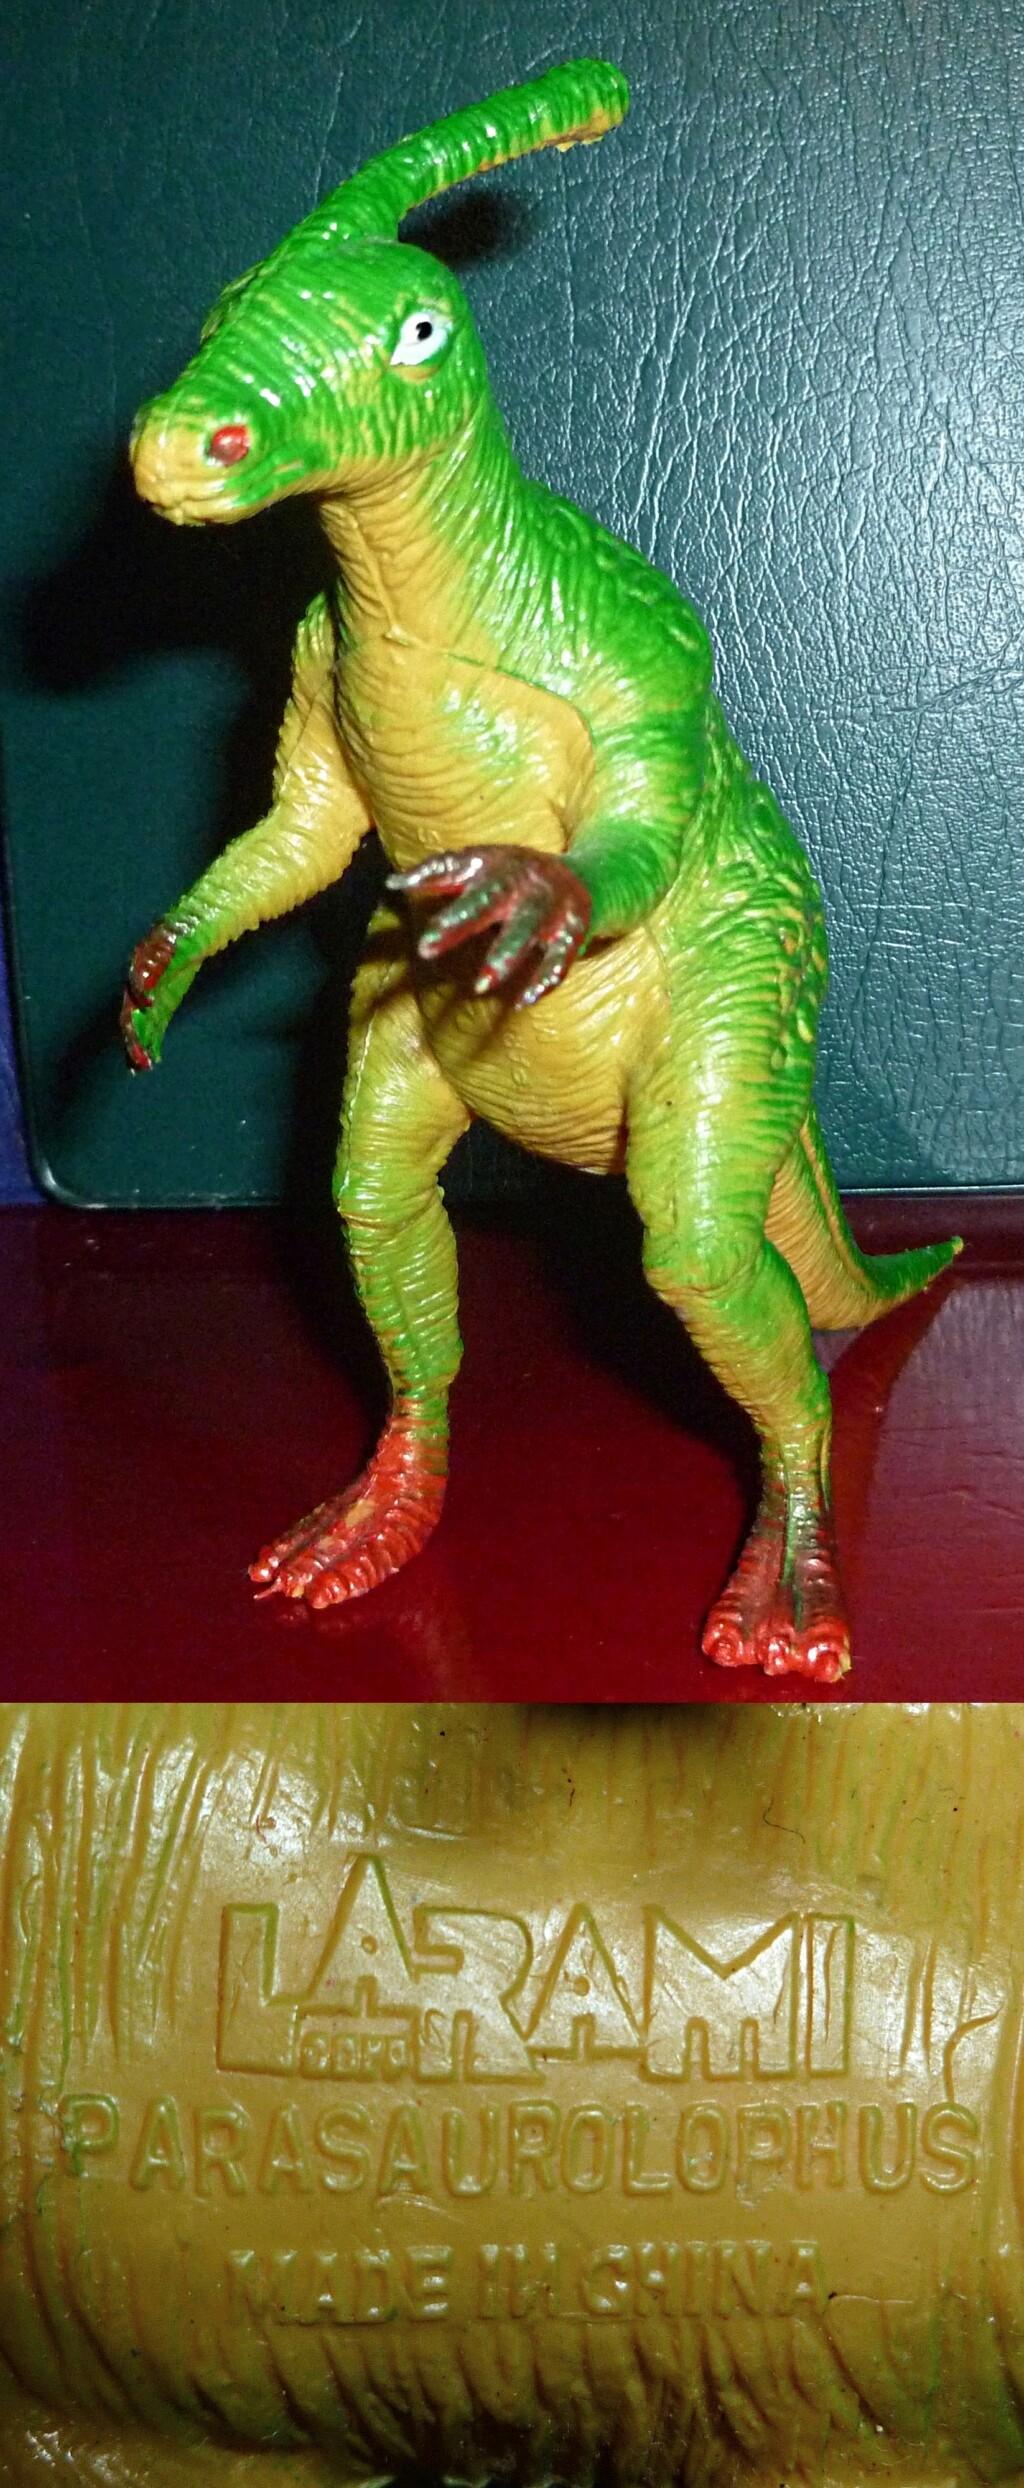 My Dinosaur figure collection: Battat 10 Dinosaur Set! - Page 2 Parasa11